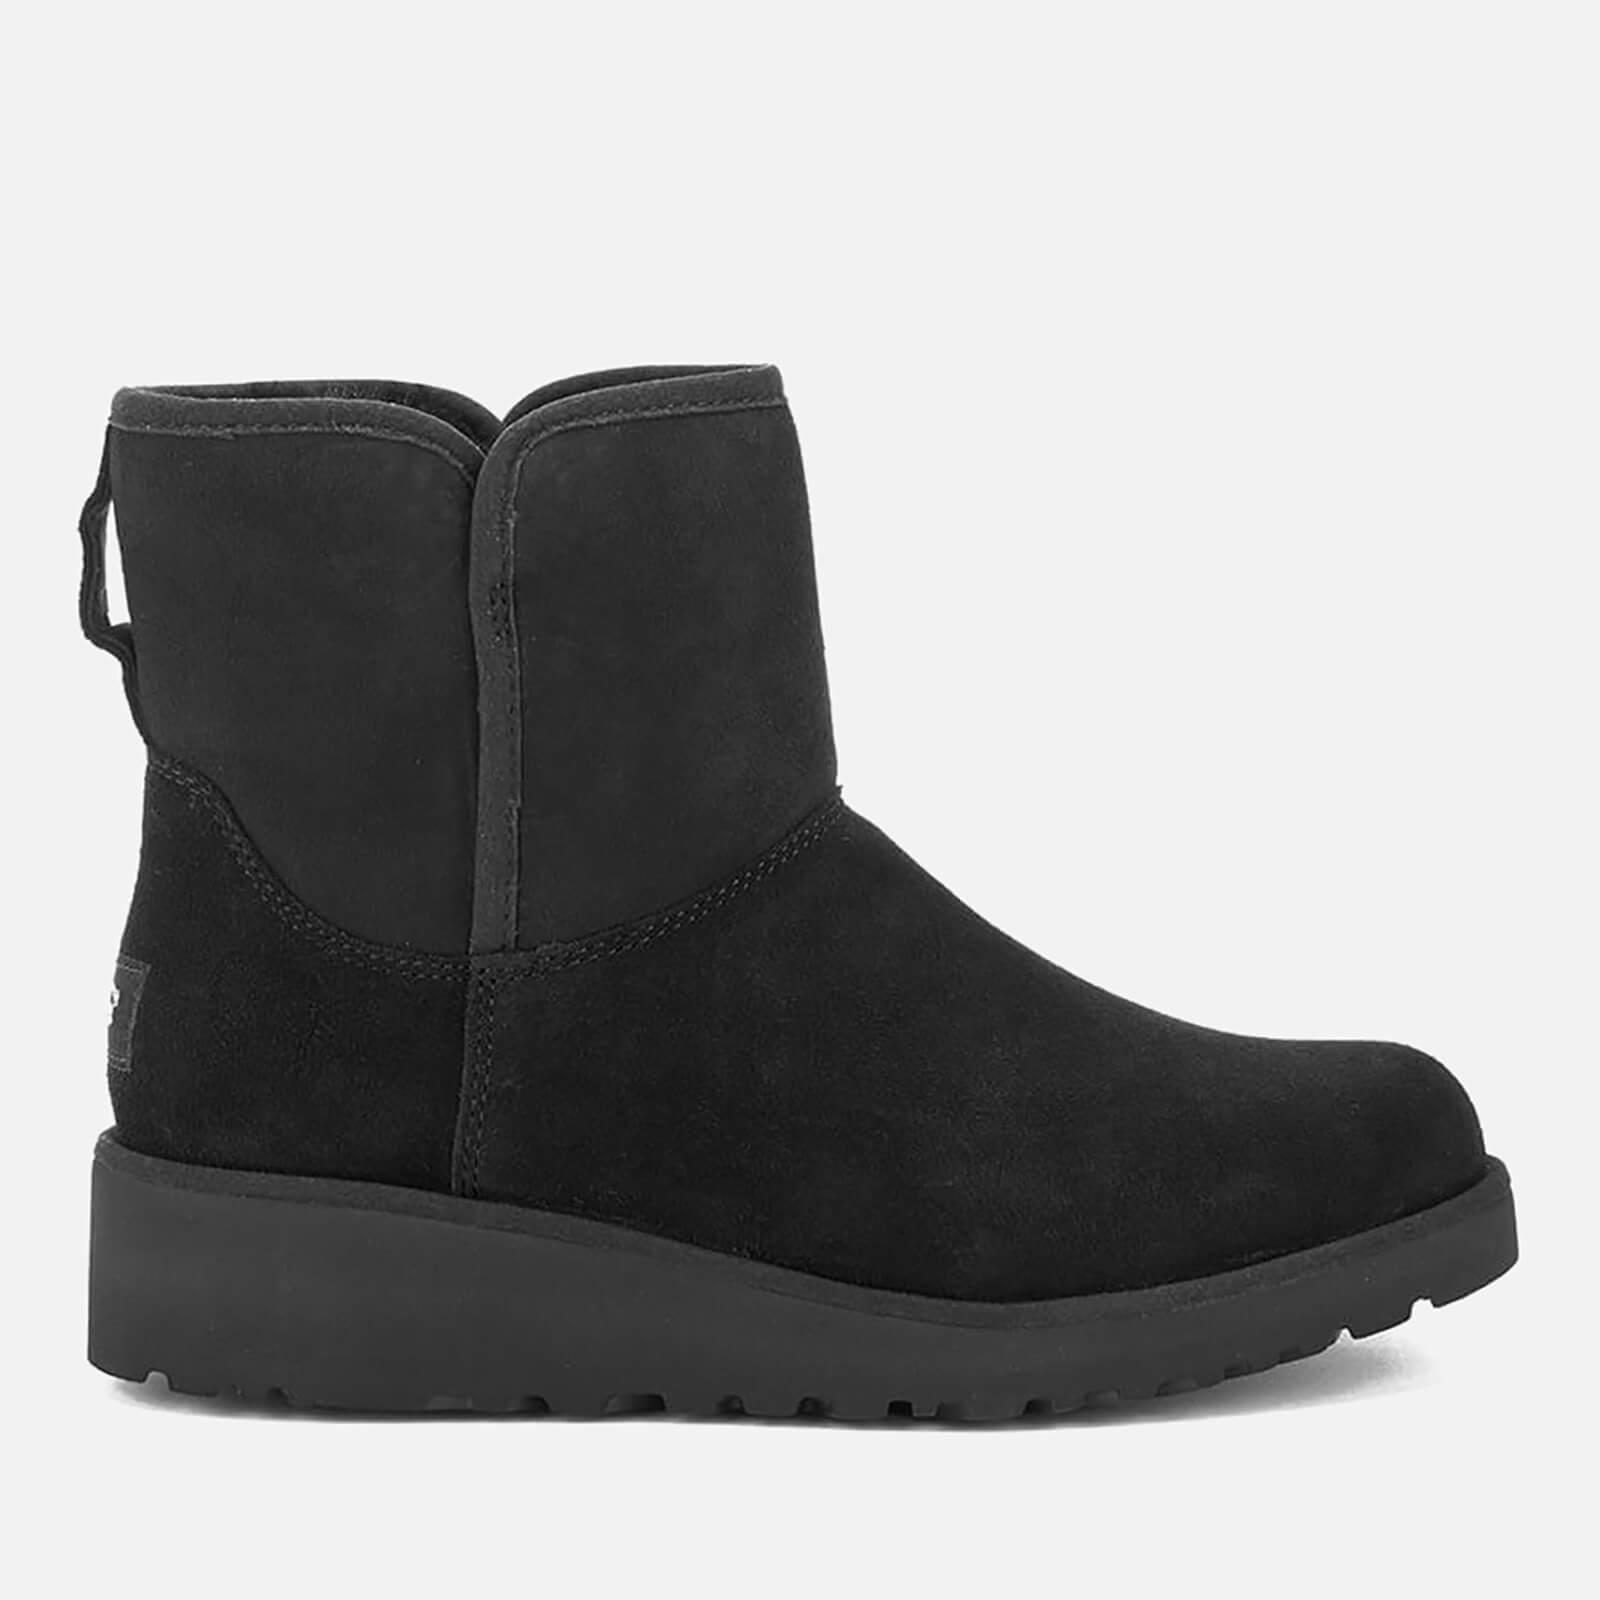 0032e1a65da UGG Women's Kristin Classic Slim Sheepskin Boots - Black